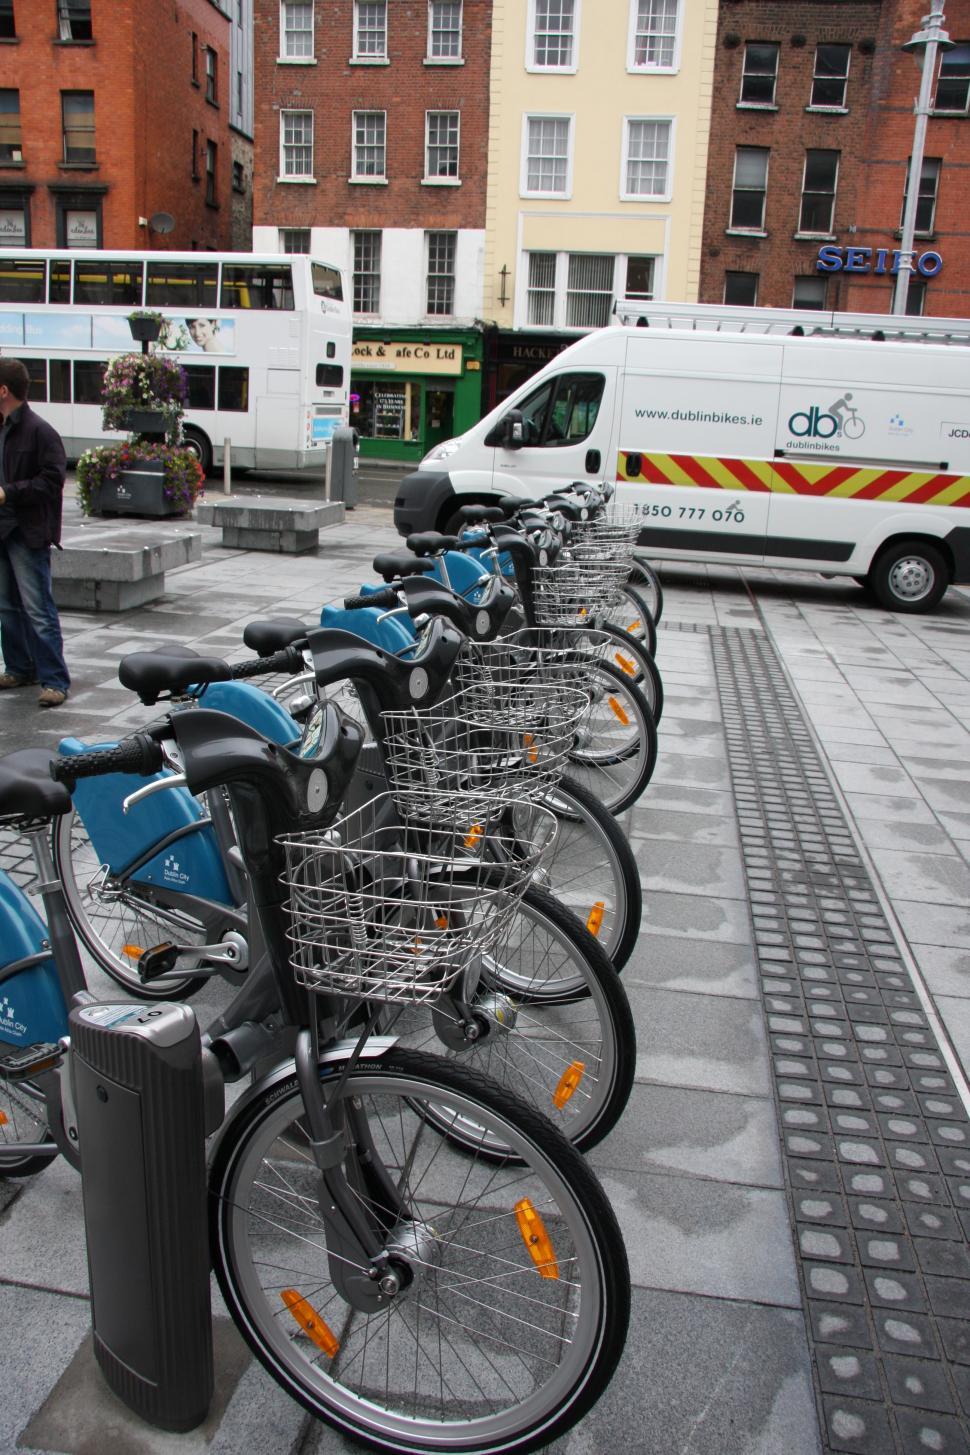 Dublinbikes.jpg